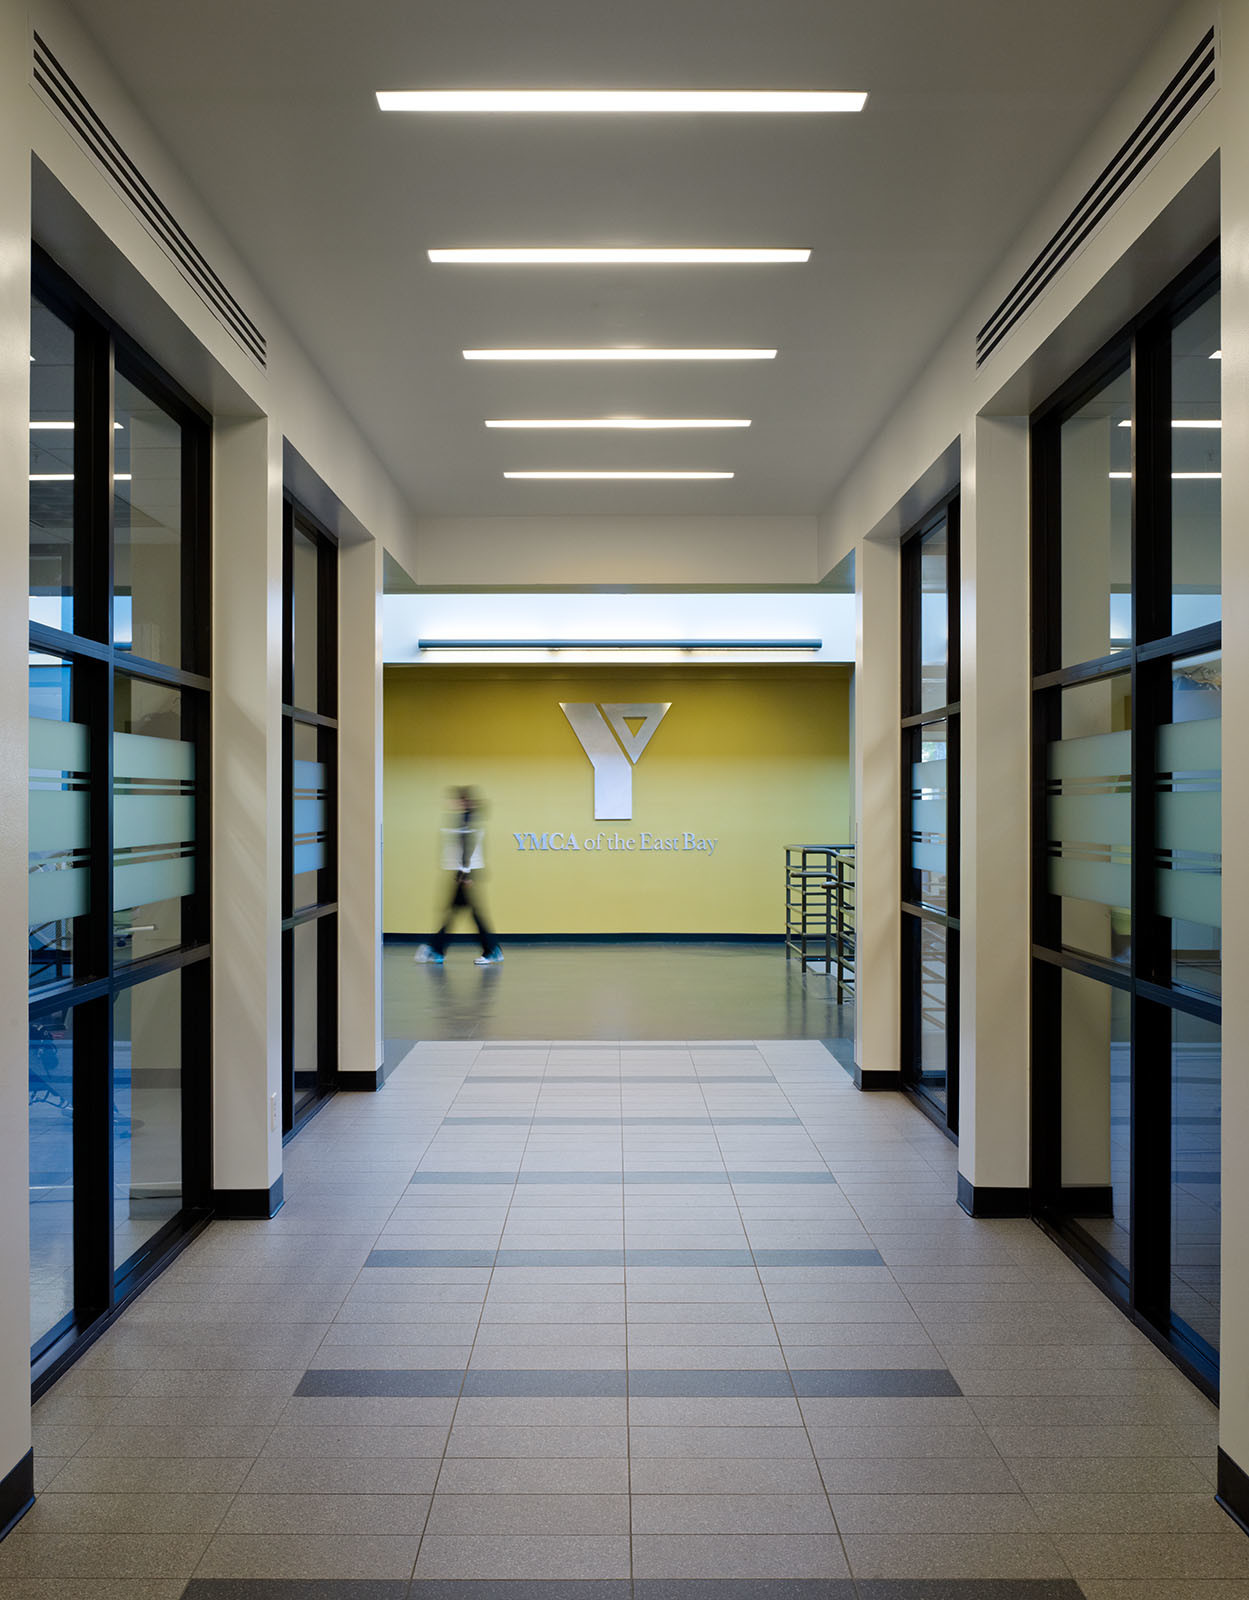 Hallway view Hilltop Family YMCA Richmond, CA fitness facility renovation ©brick-inc